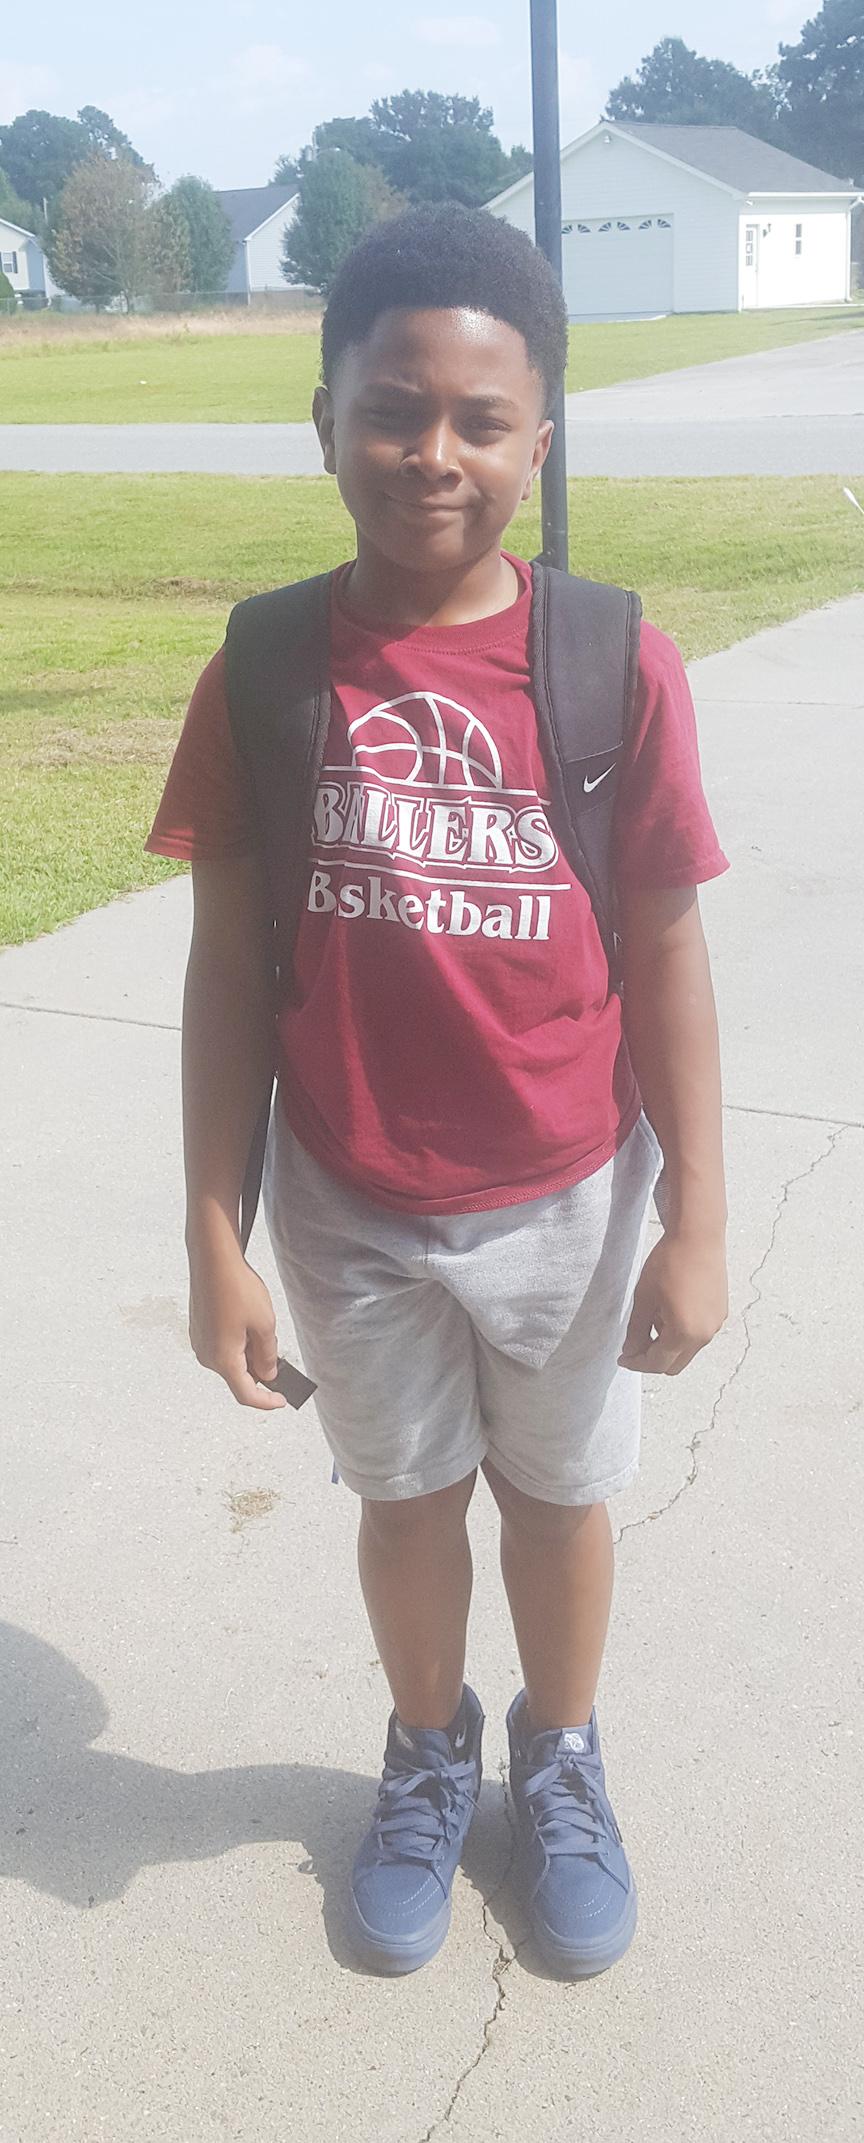 Braxton Loftin-Myers, fifth grade, La Grange Elementary School